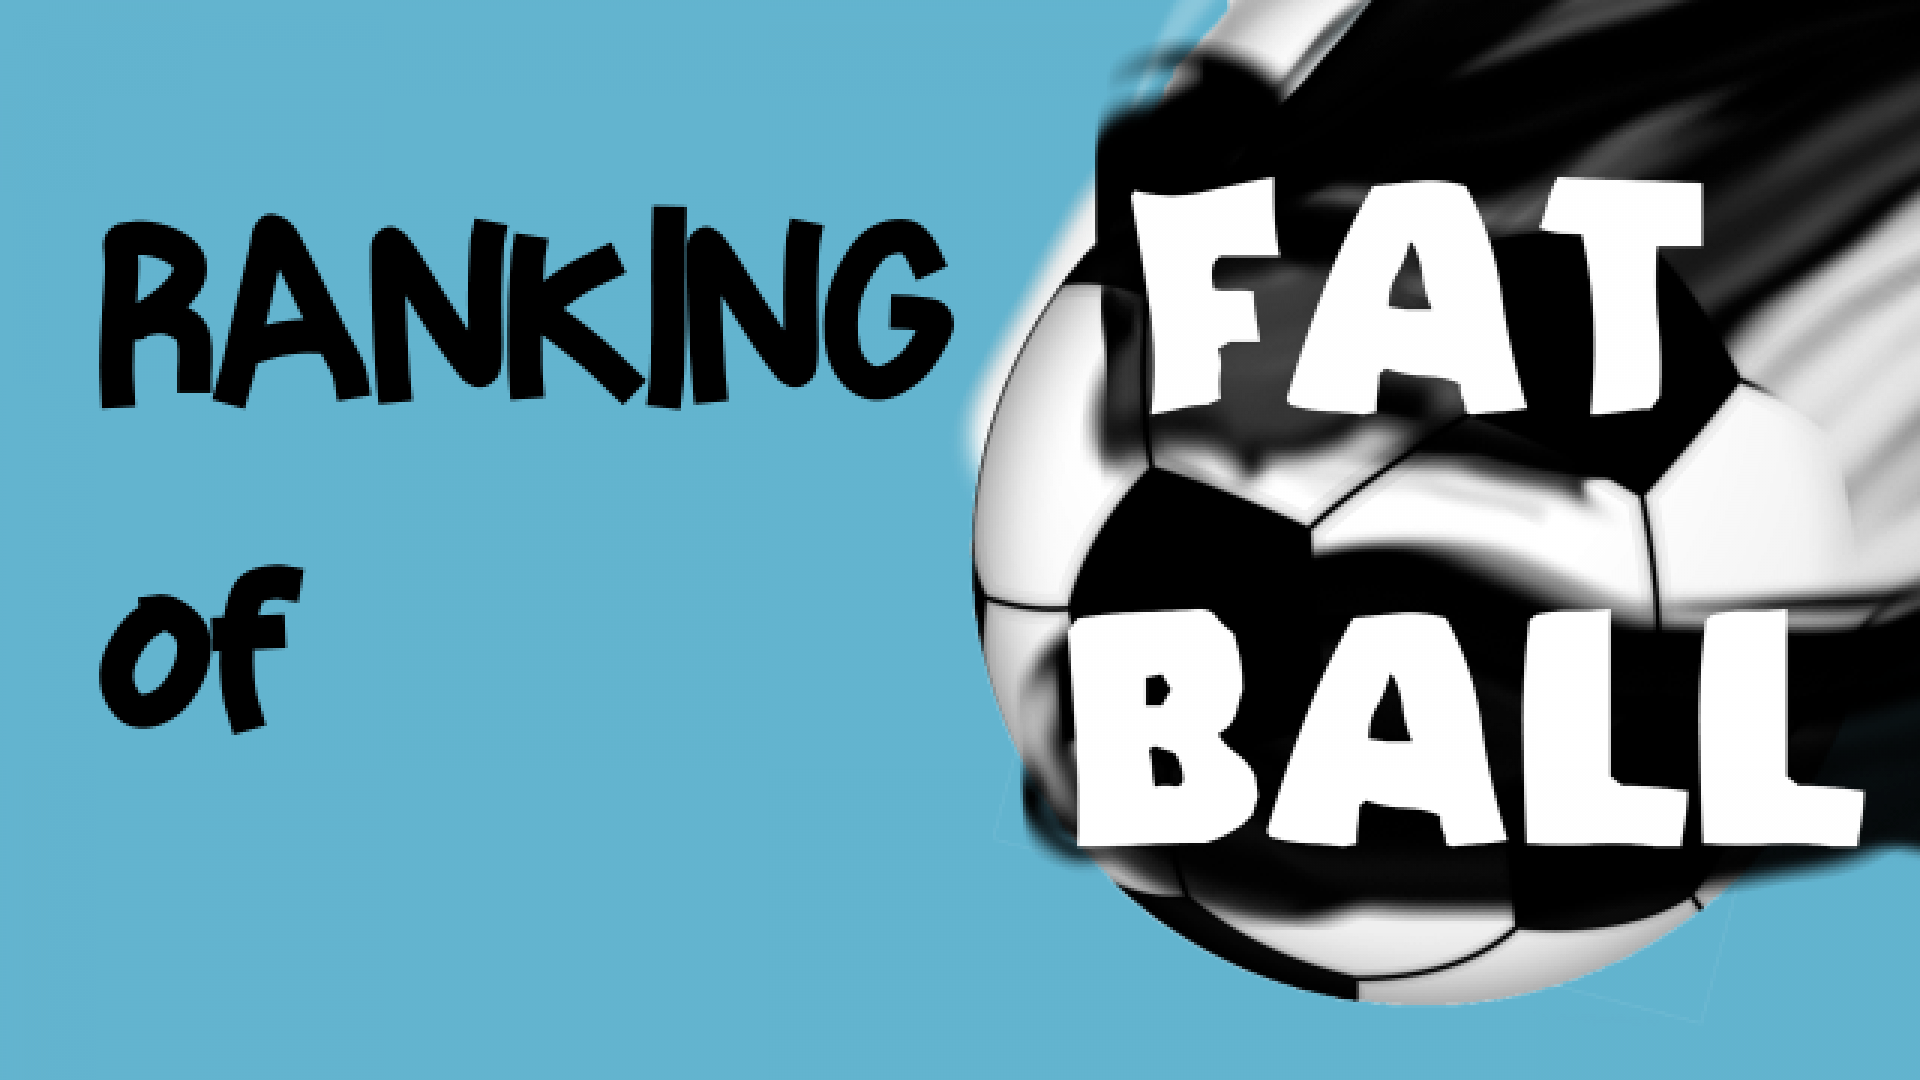 Fatball: A new ball